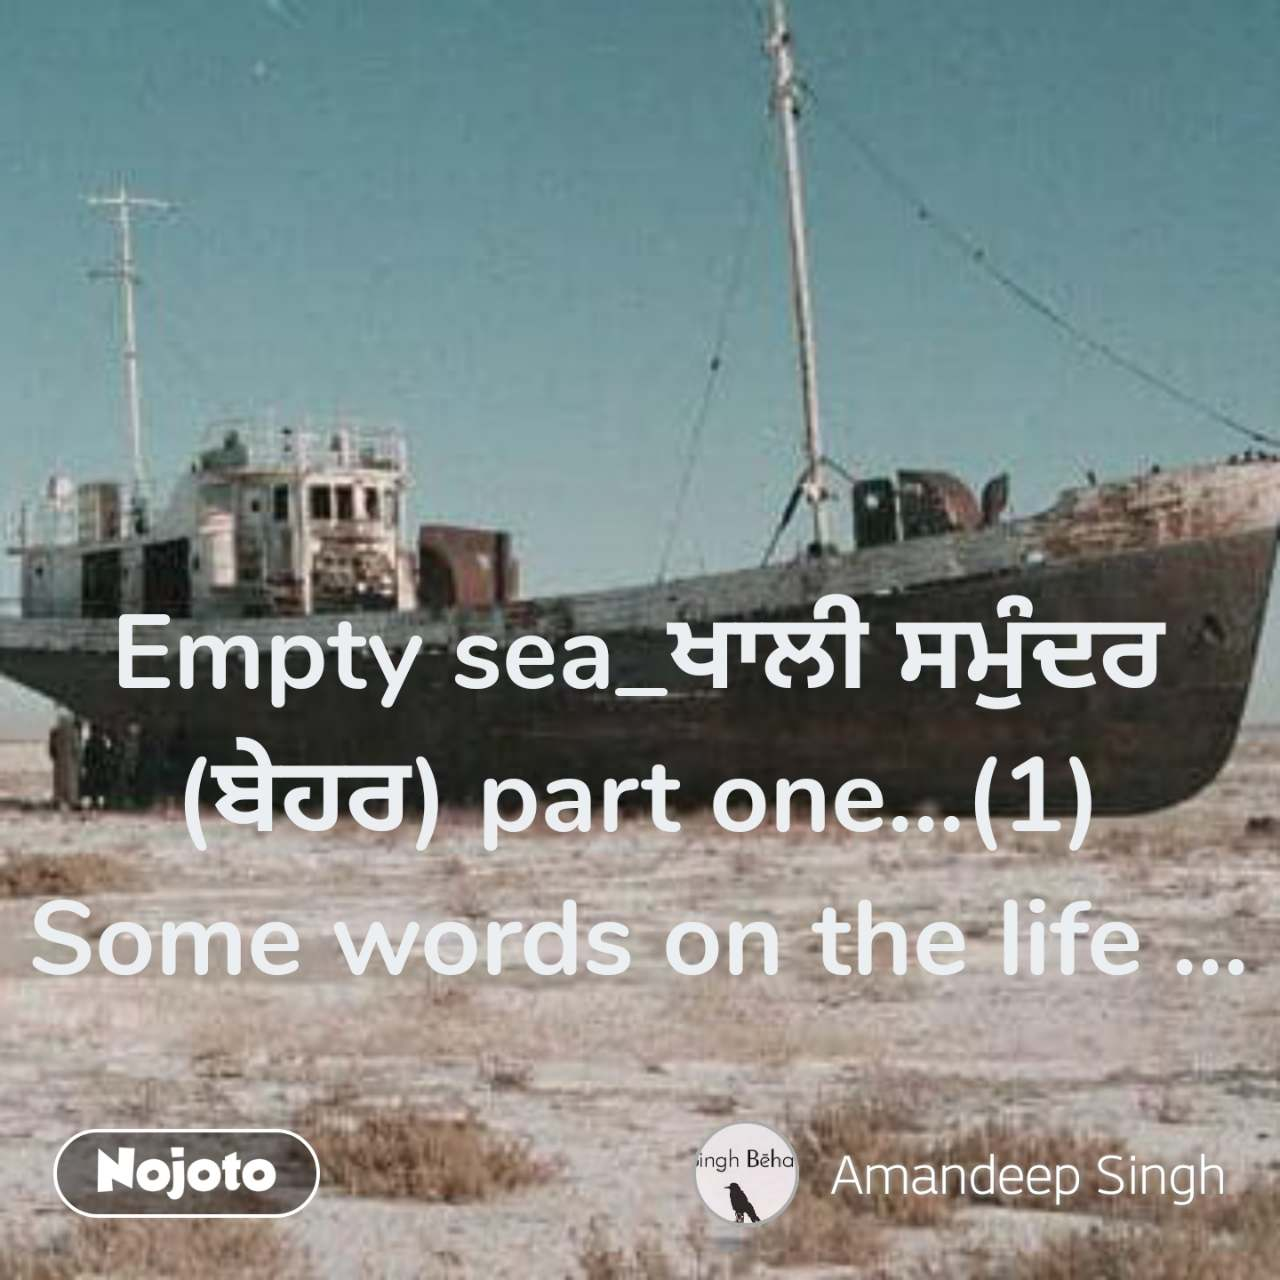 Empty sea_ਖਾਲੀ ਸਮੁੰਦਰ (ਬੇਹਰ) part one...(1) Some words on the life ...